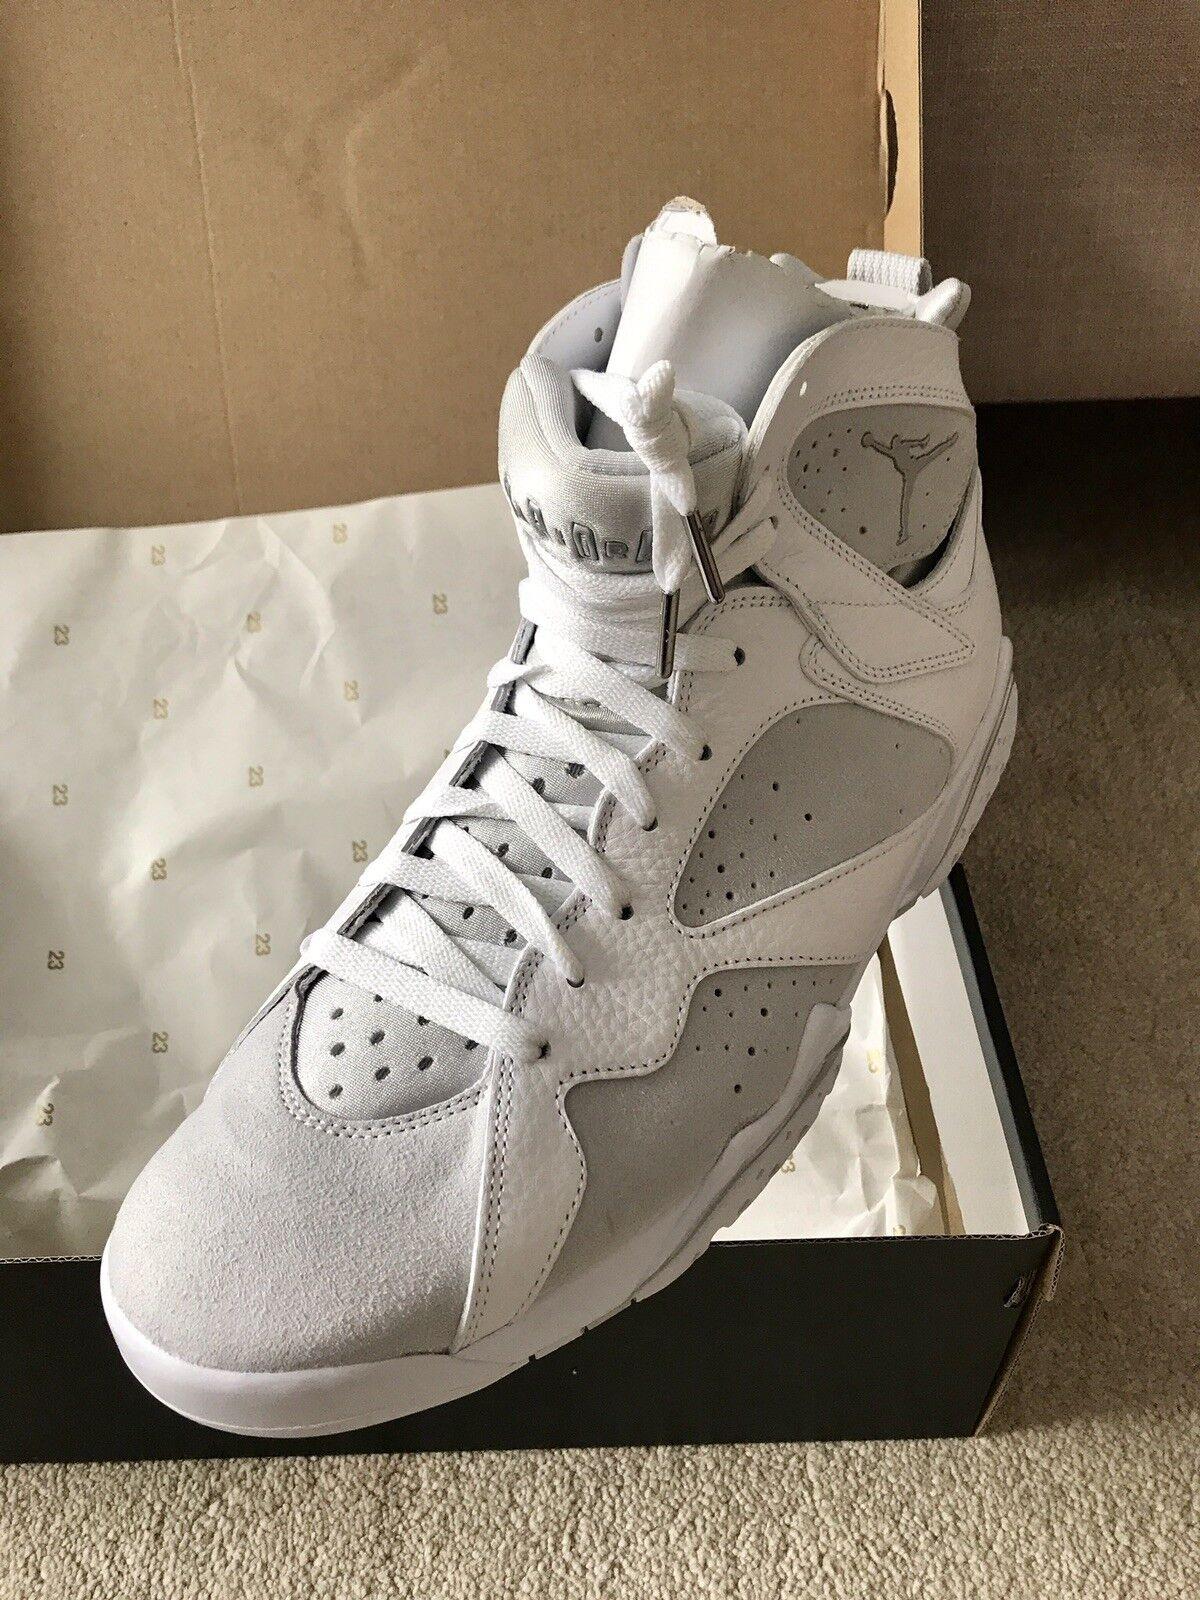 Nike Air Jordan 7 - 'Pure Money' limited edition in size 10.5uk & unworn